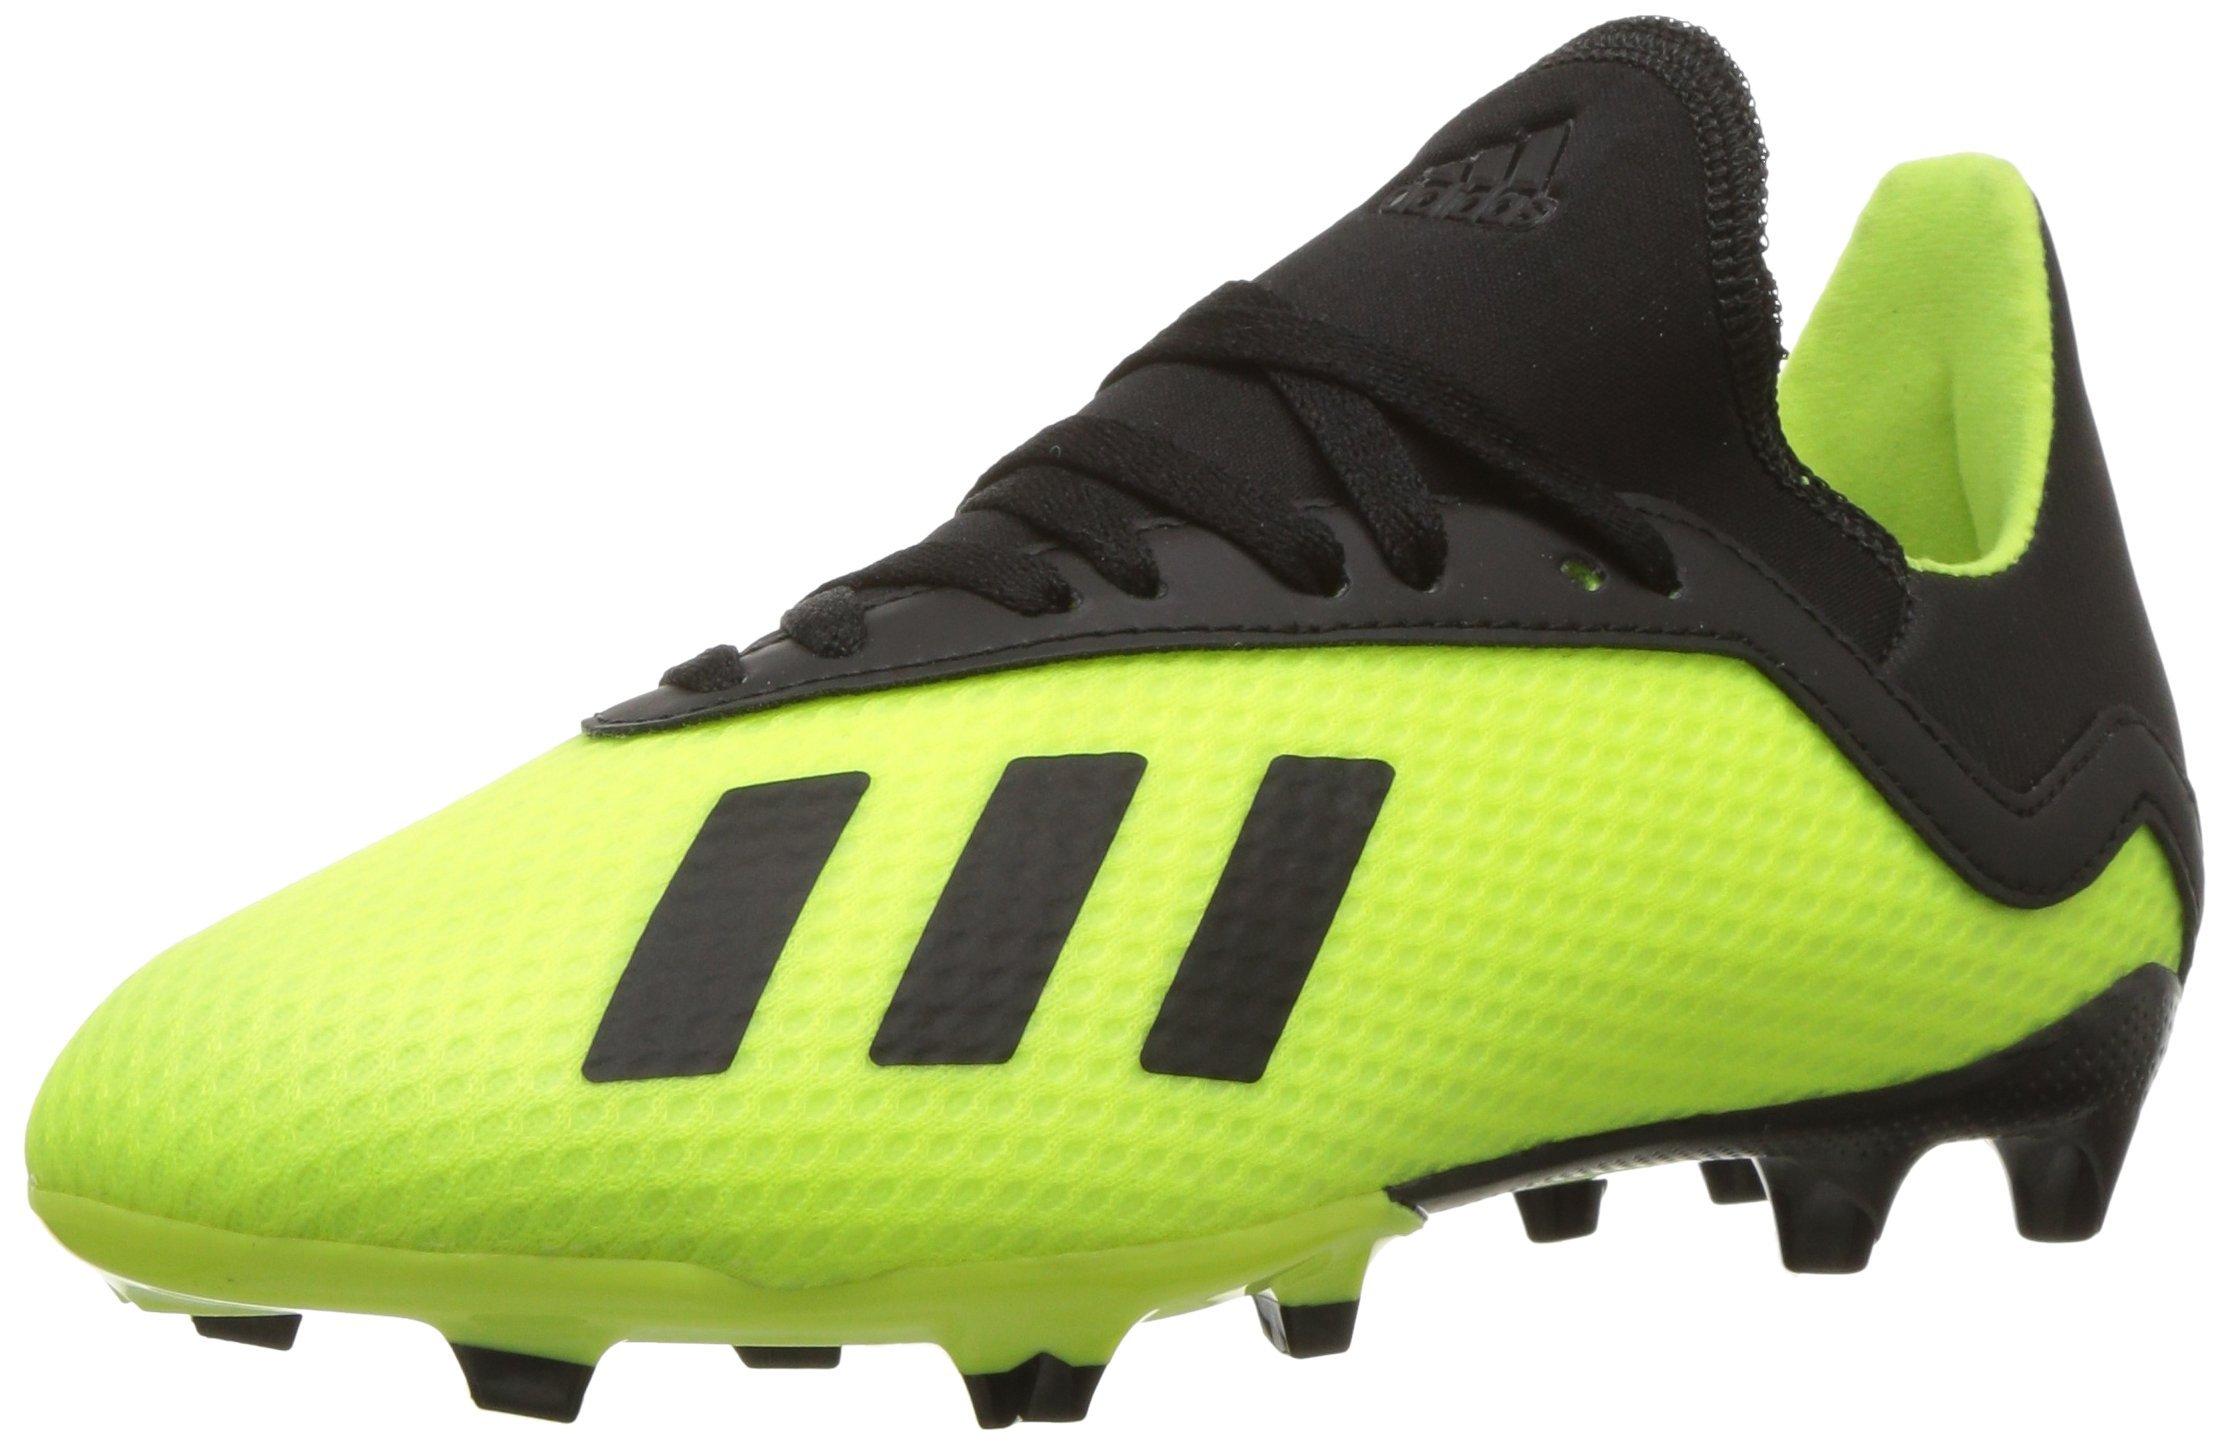 adidas Unisex X 18.3 Firm Ground Soccer Shoe Black/Solar Yellow, 5 M US Big Kid